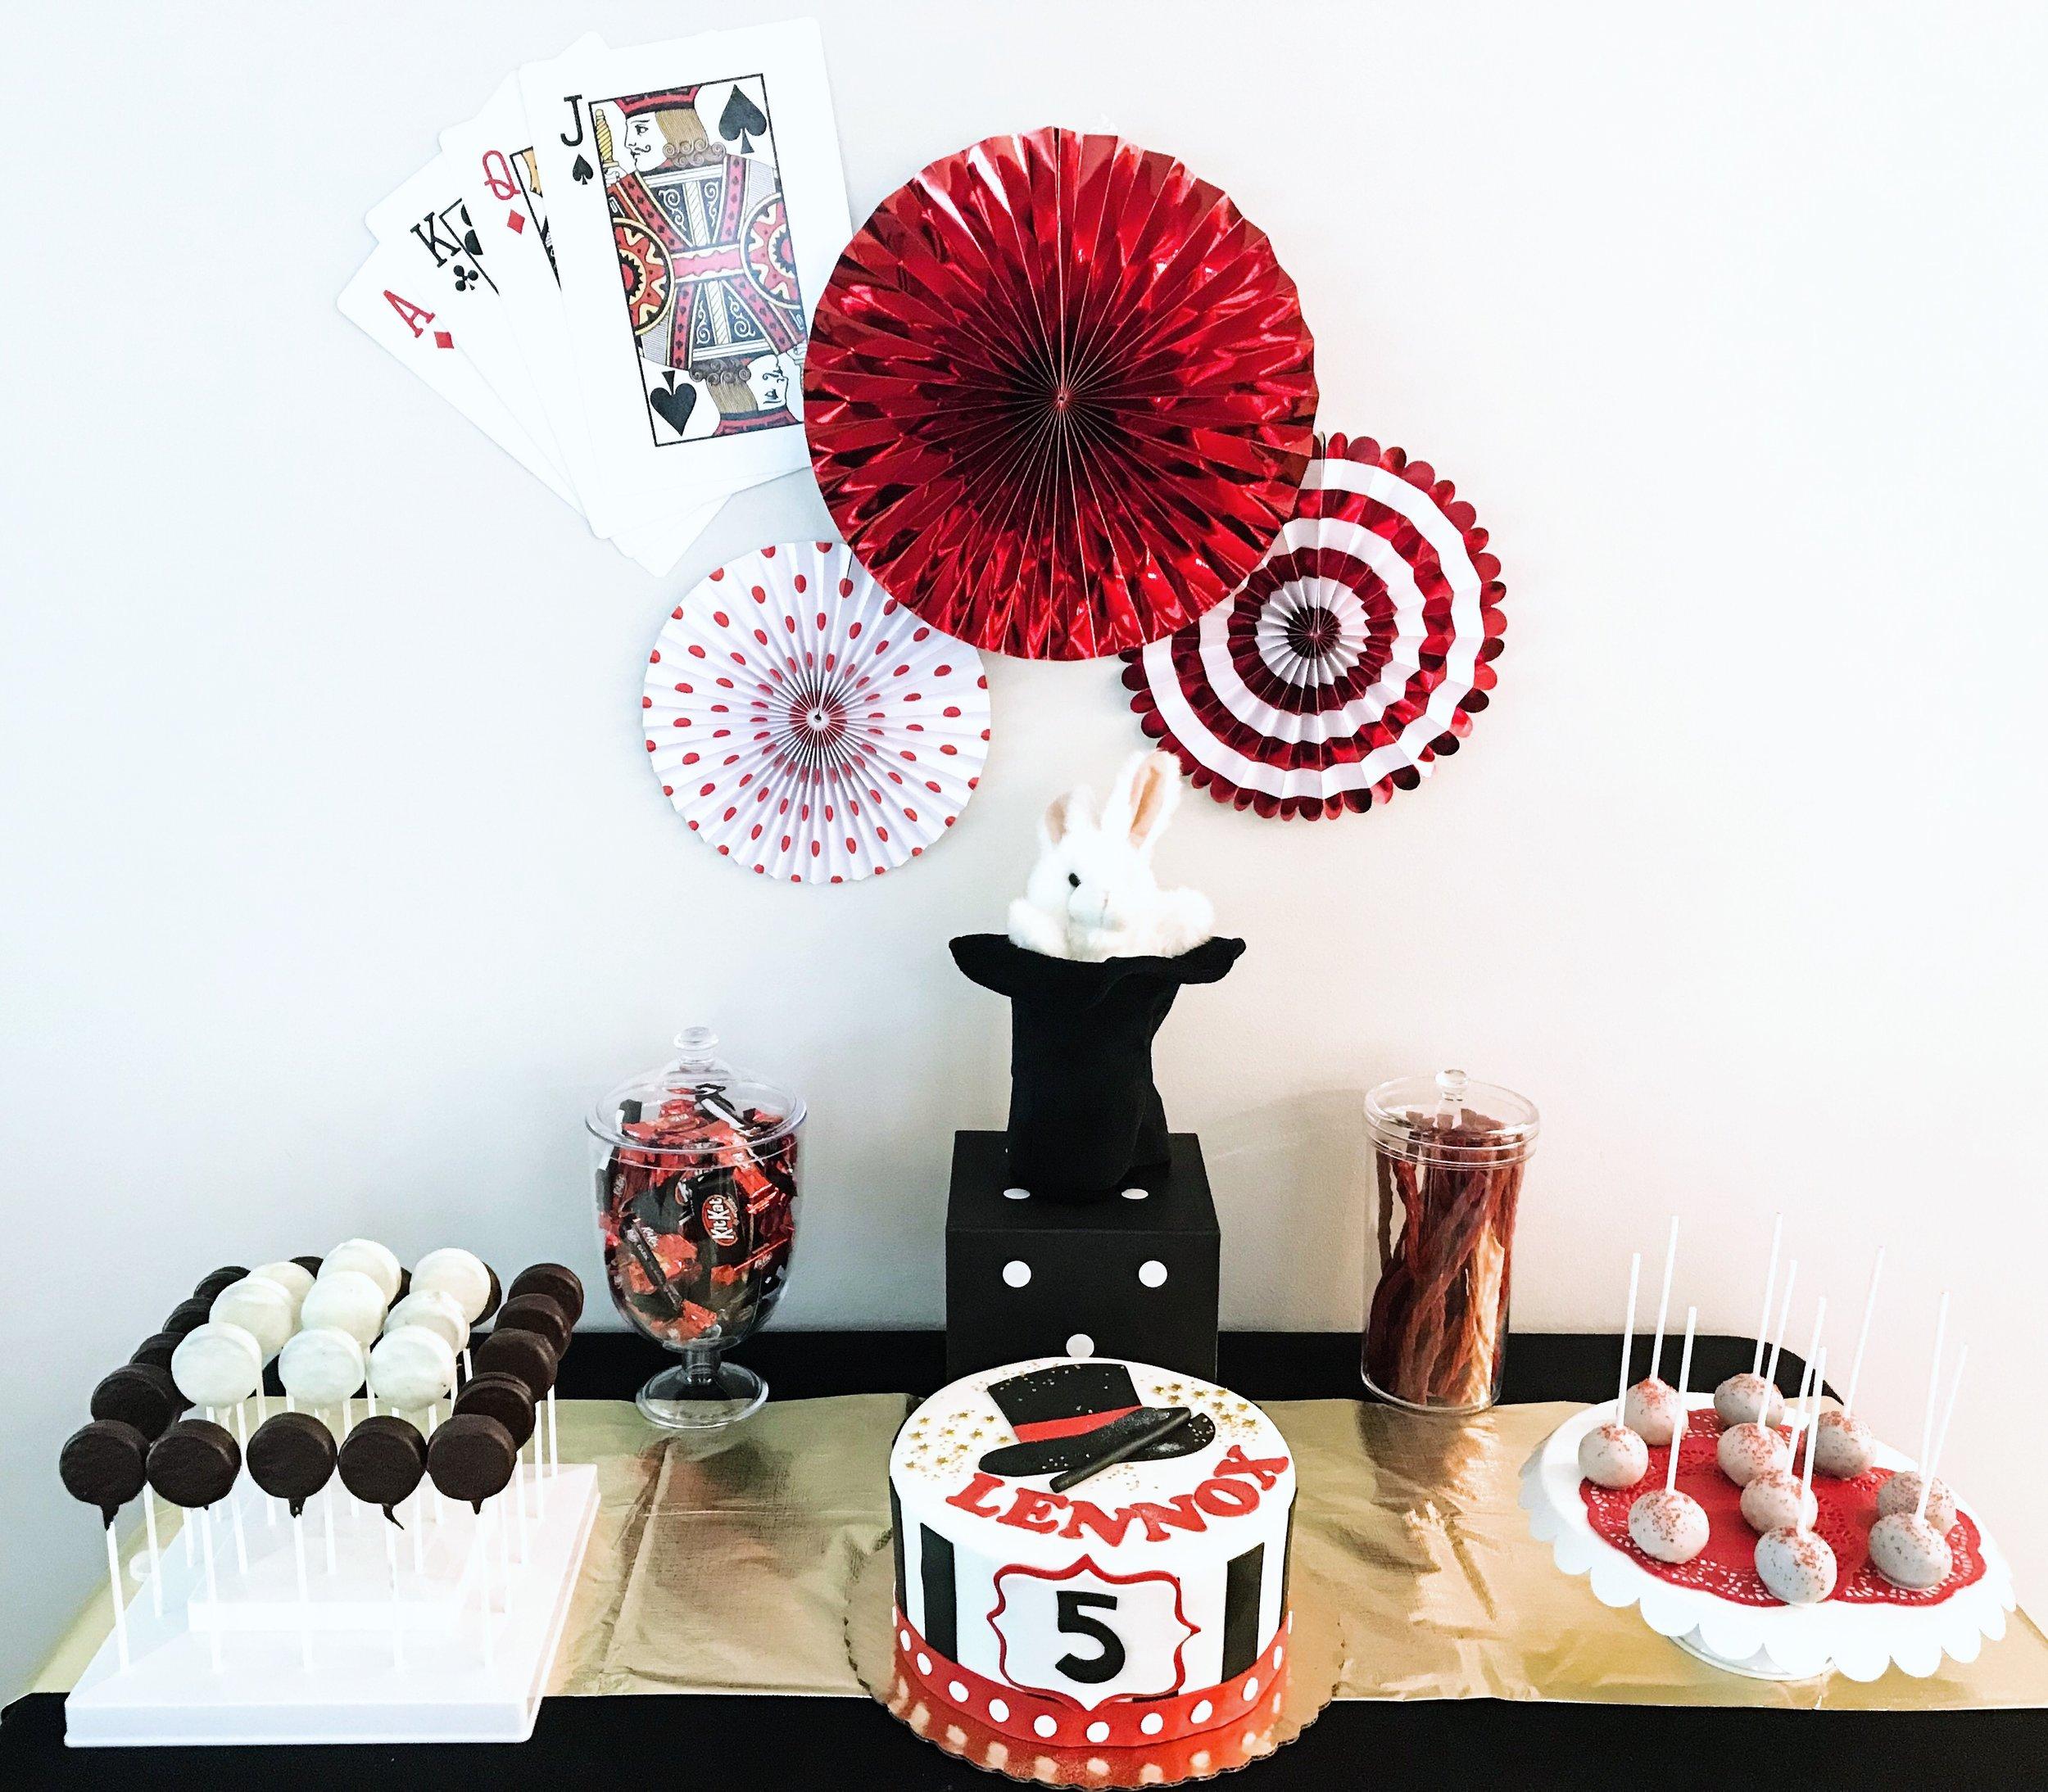 Magic Themed Birthday Party Dessert and Cake Idea. Dessert Table For Magic Birthday Party. Magician Birthday Party Ideas. Magic Birthday Cakes. Magic themed cake pops and oreo pops. Magic hat birthday cake and dessert table. #magic #cake #ideas #birthday #dessert